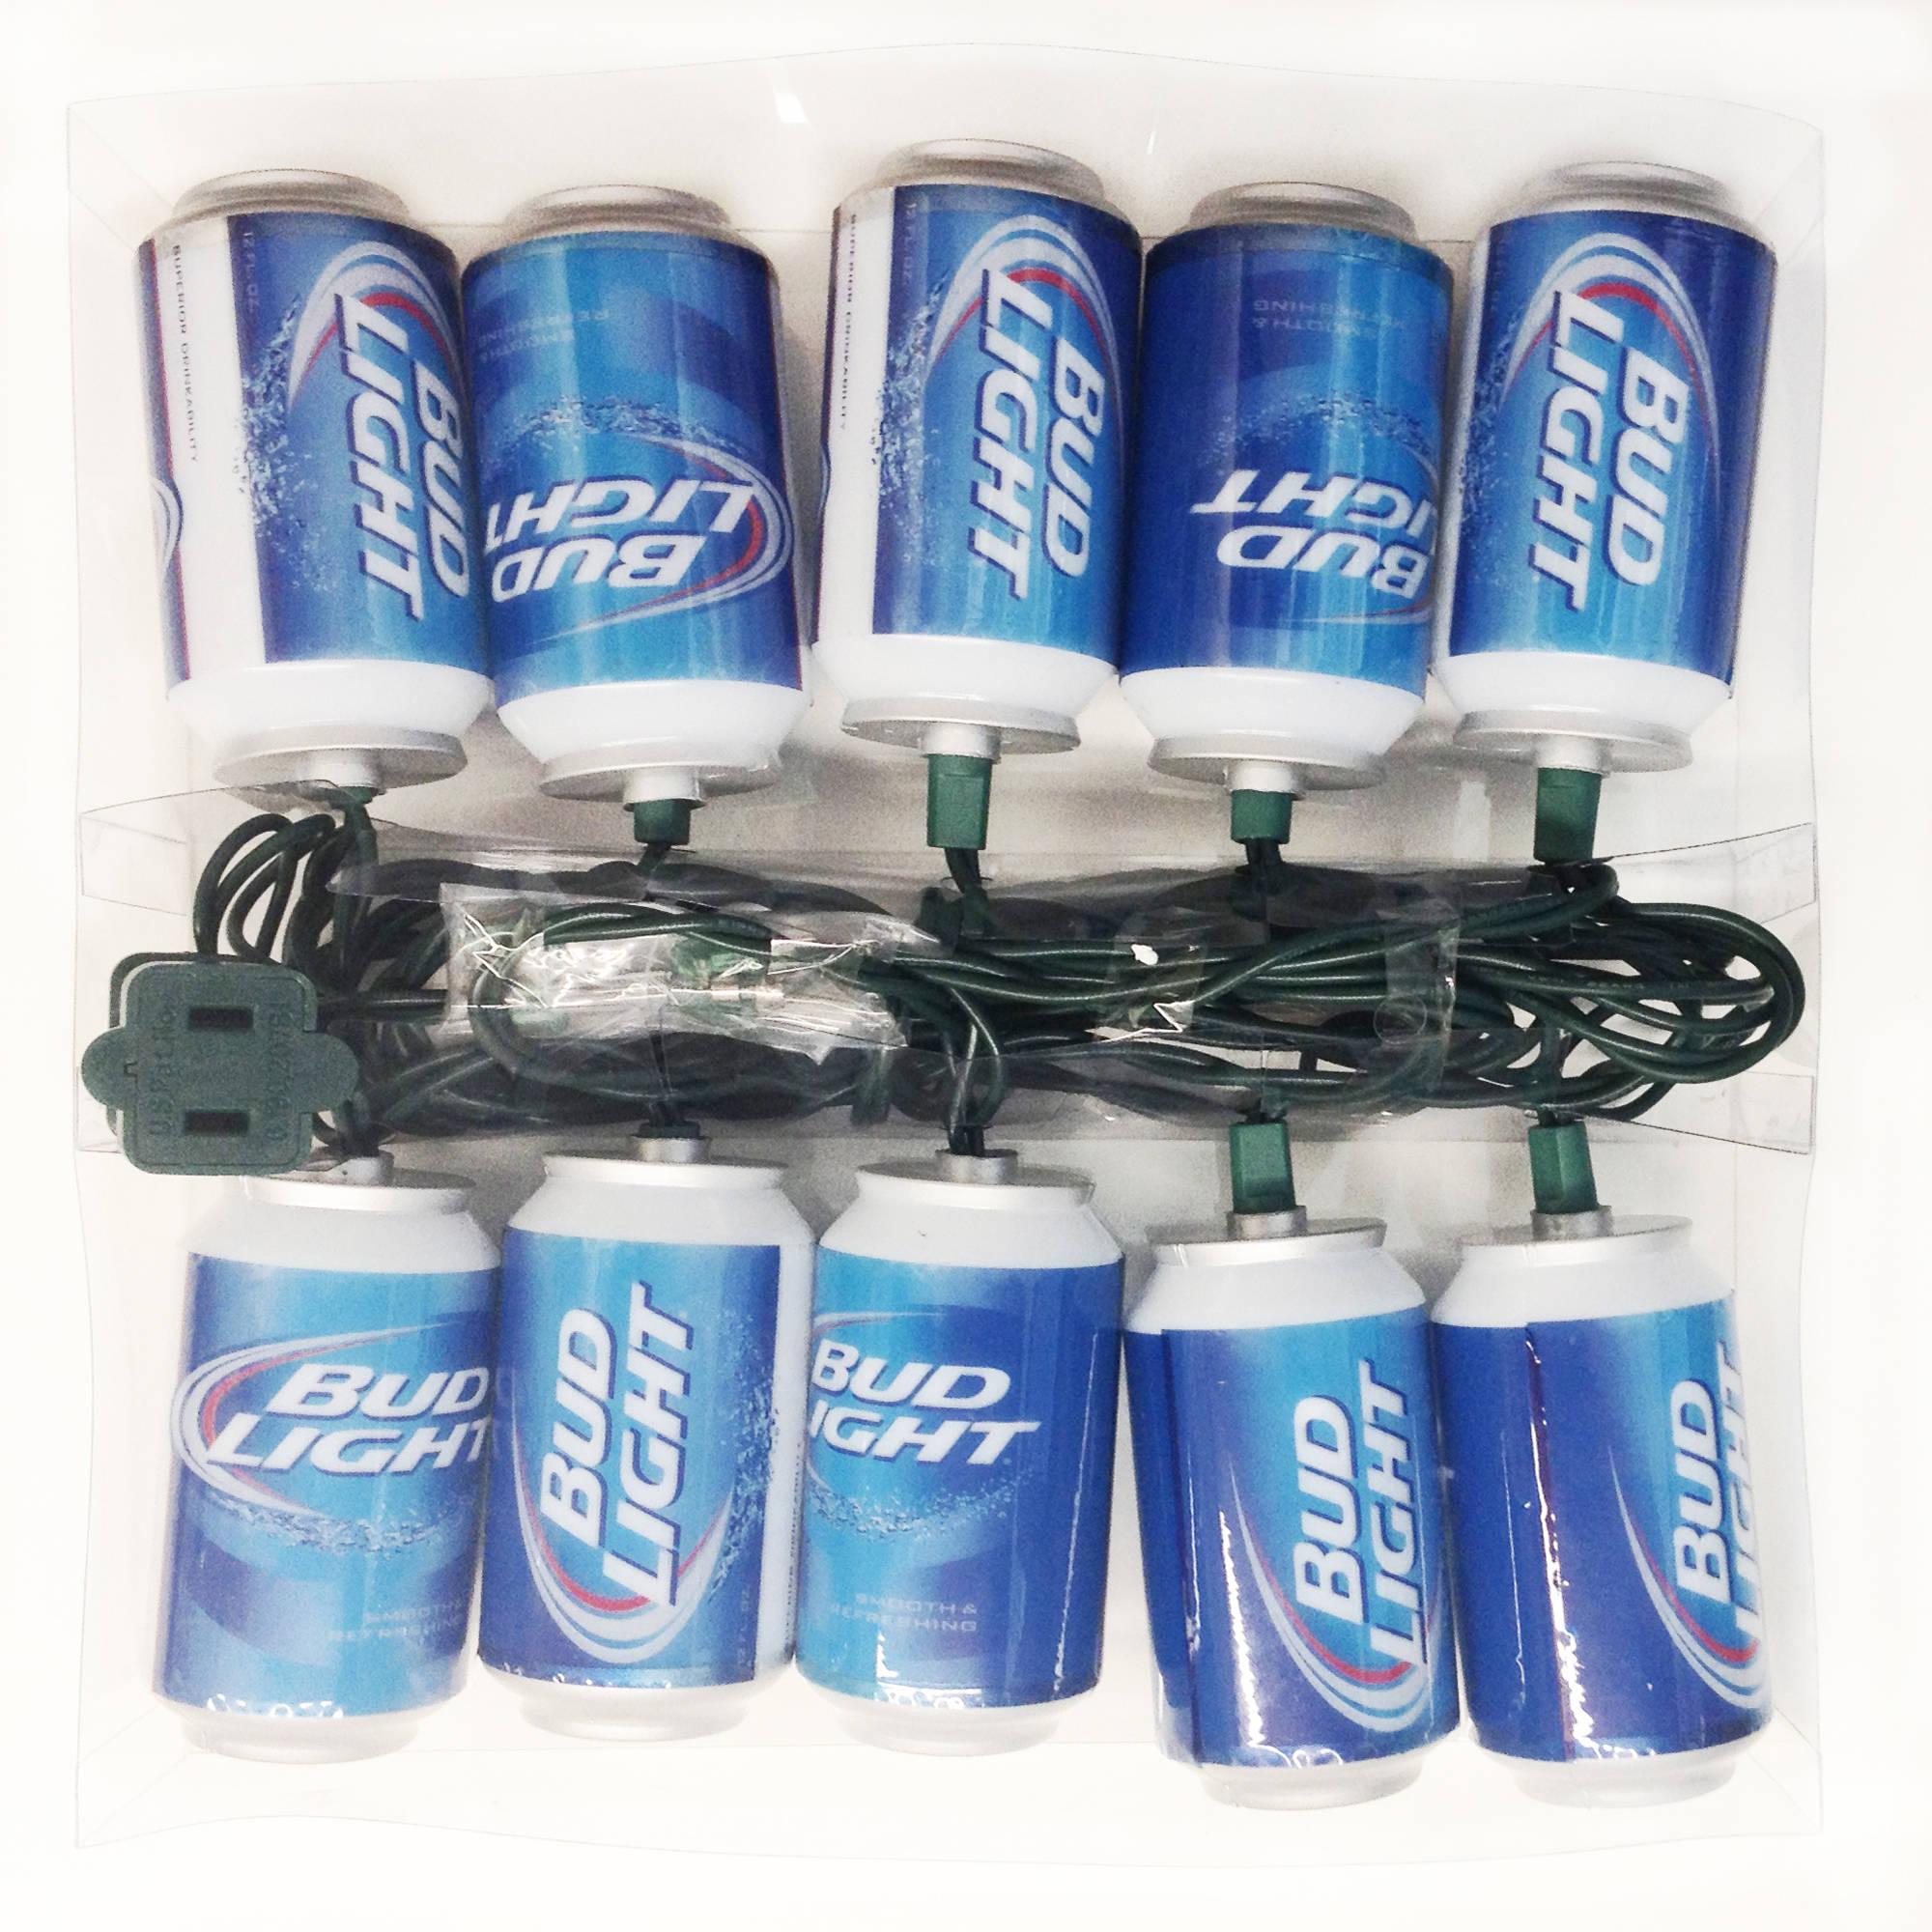 Home Bud light beer, Bud light can, Can lights